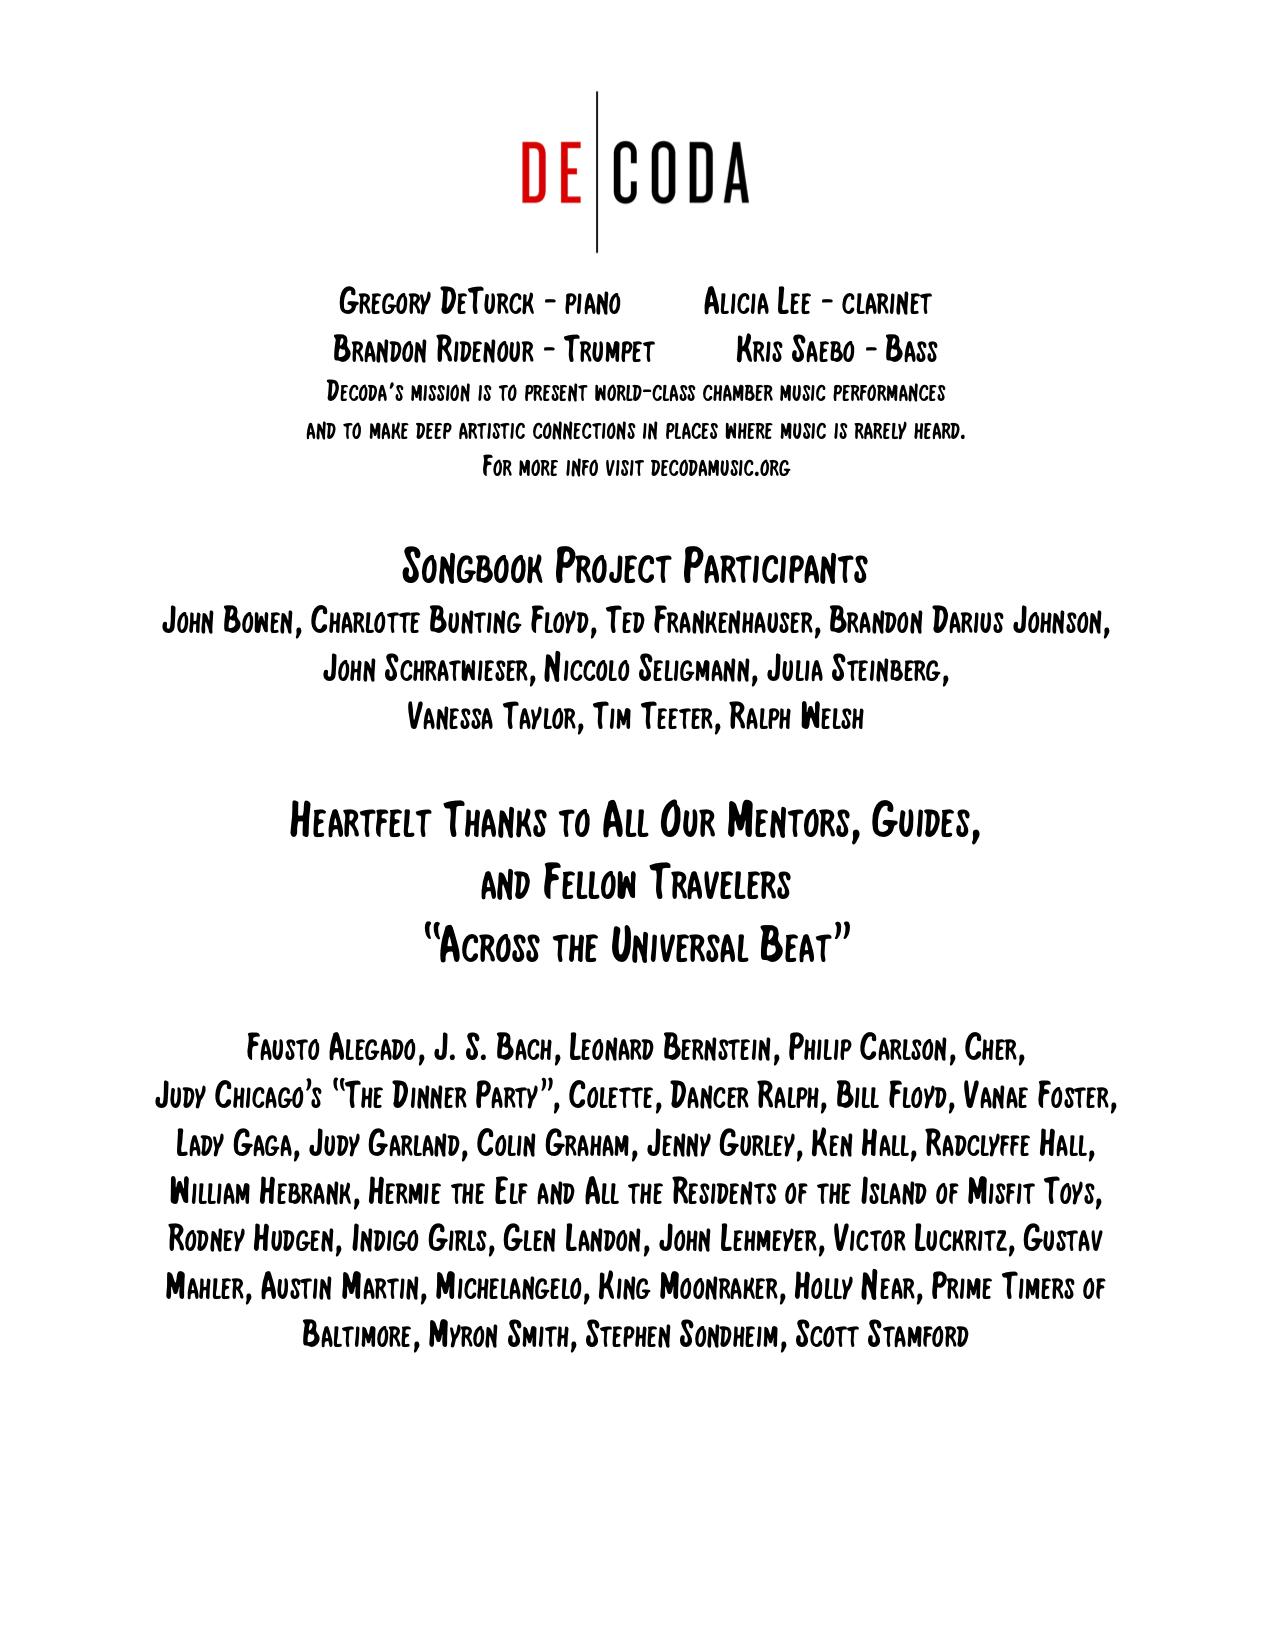 Concert Program, page 4